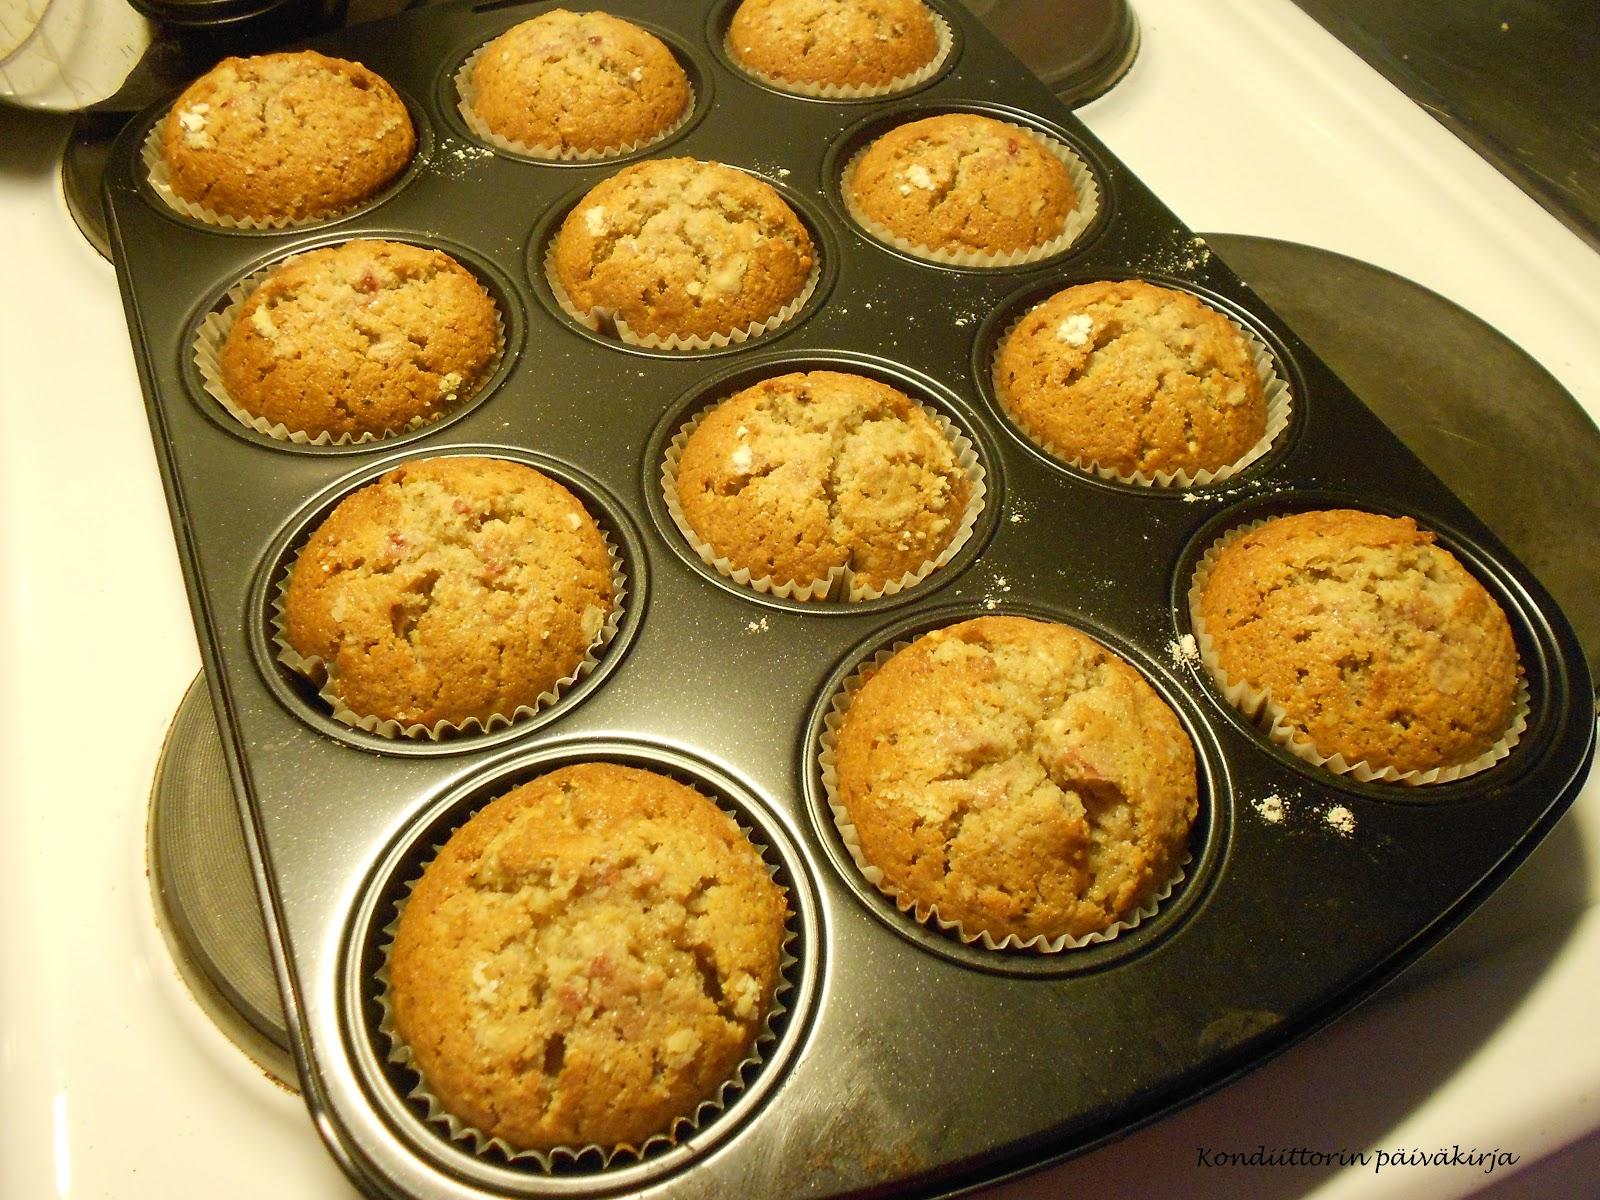 Muffinssit Ohje